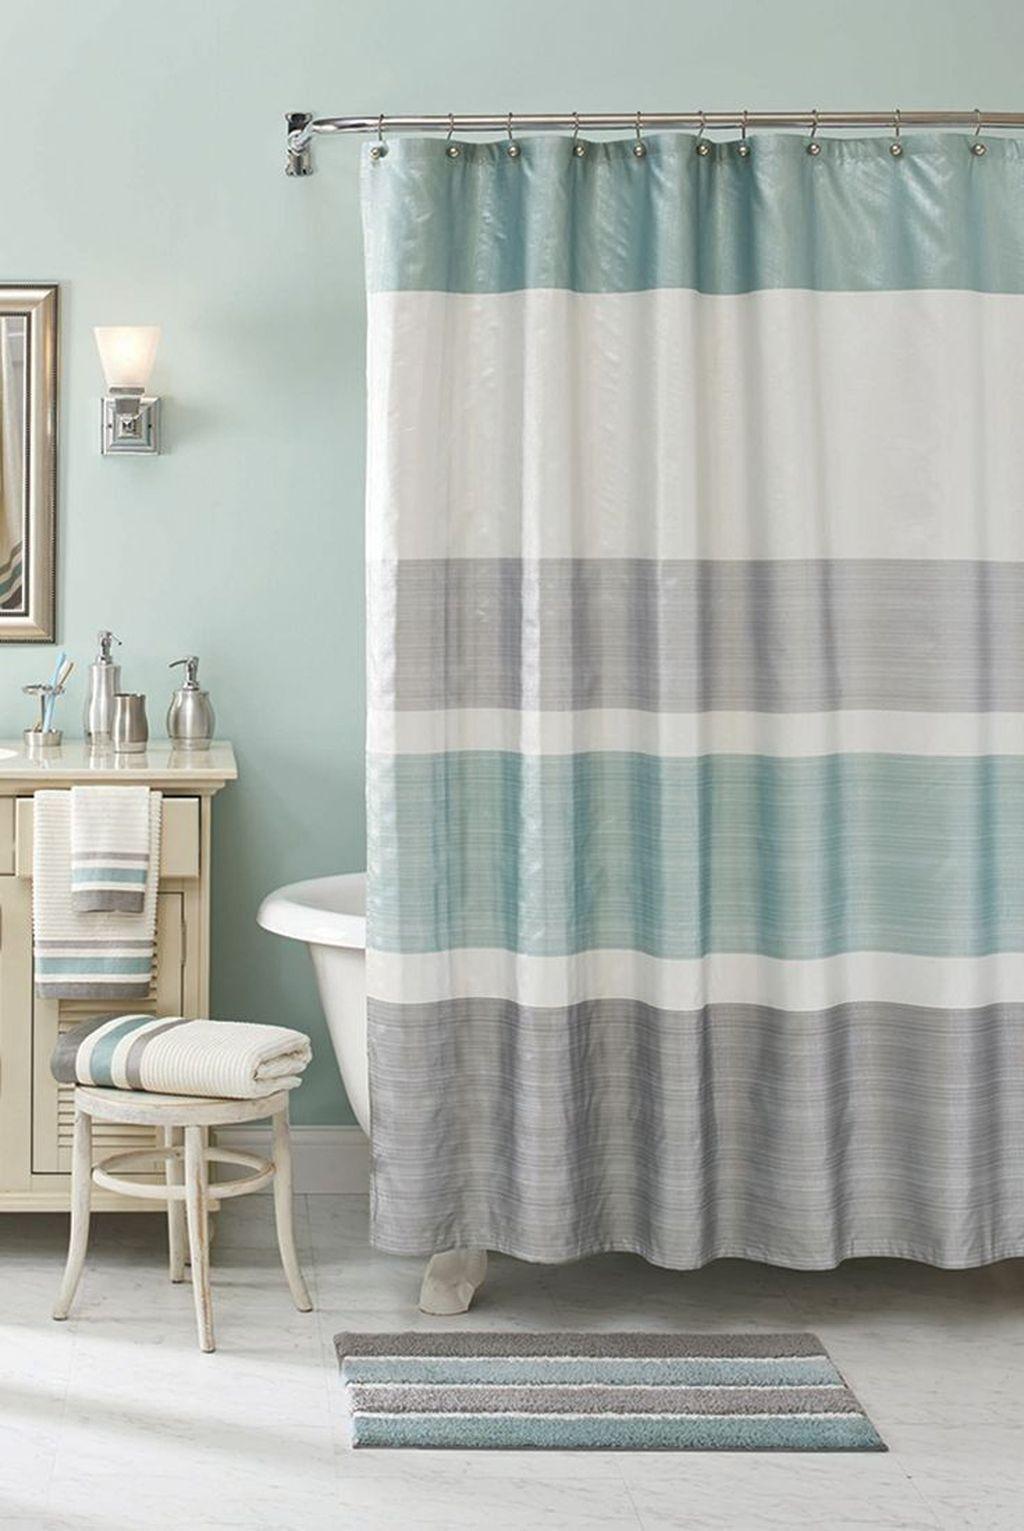 Cool 39 Stylish Coastal Nautical Bathroom Designs Ideas Bathroomshower Beach Shower Curtains Nautical Bathroom Decor Beach Bathroom Decor